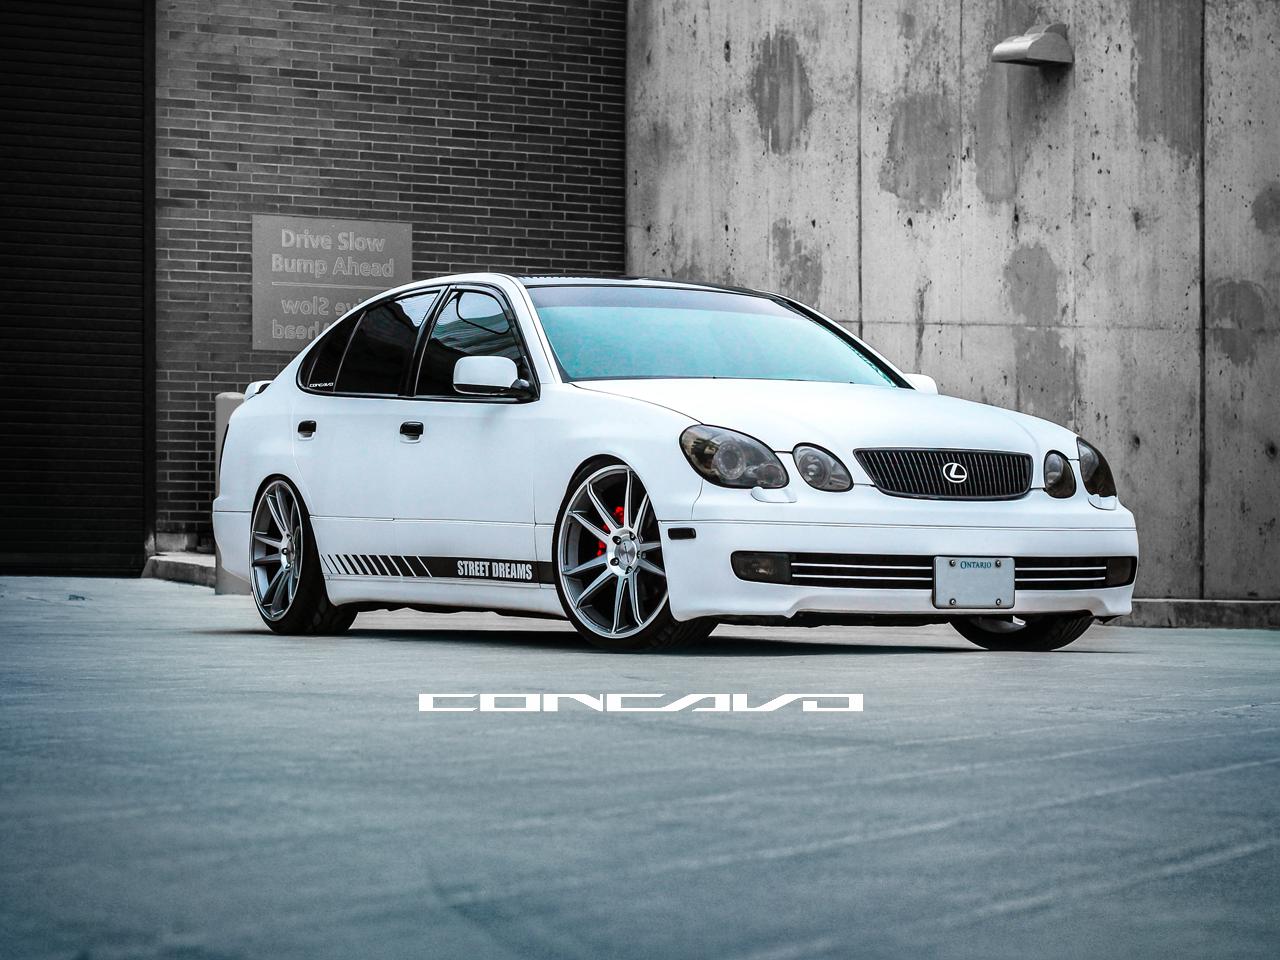 Custom Lexus Gs400 On Custom Concavo Cw S5 Sitting Clean